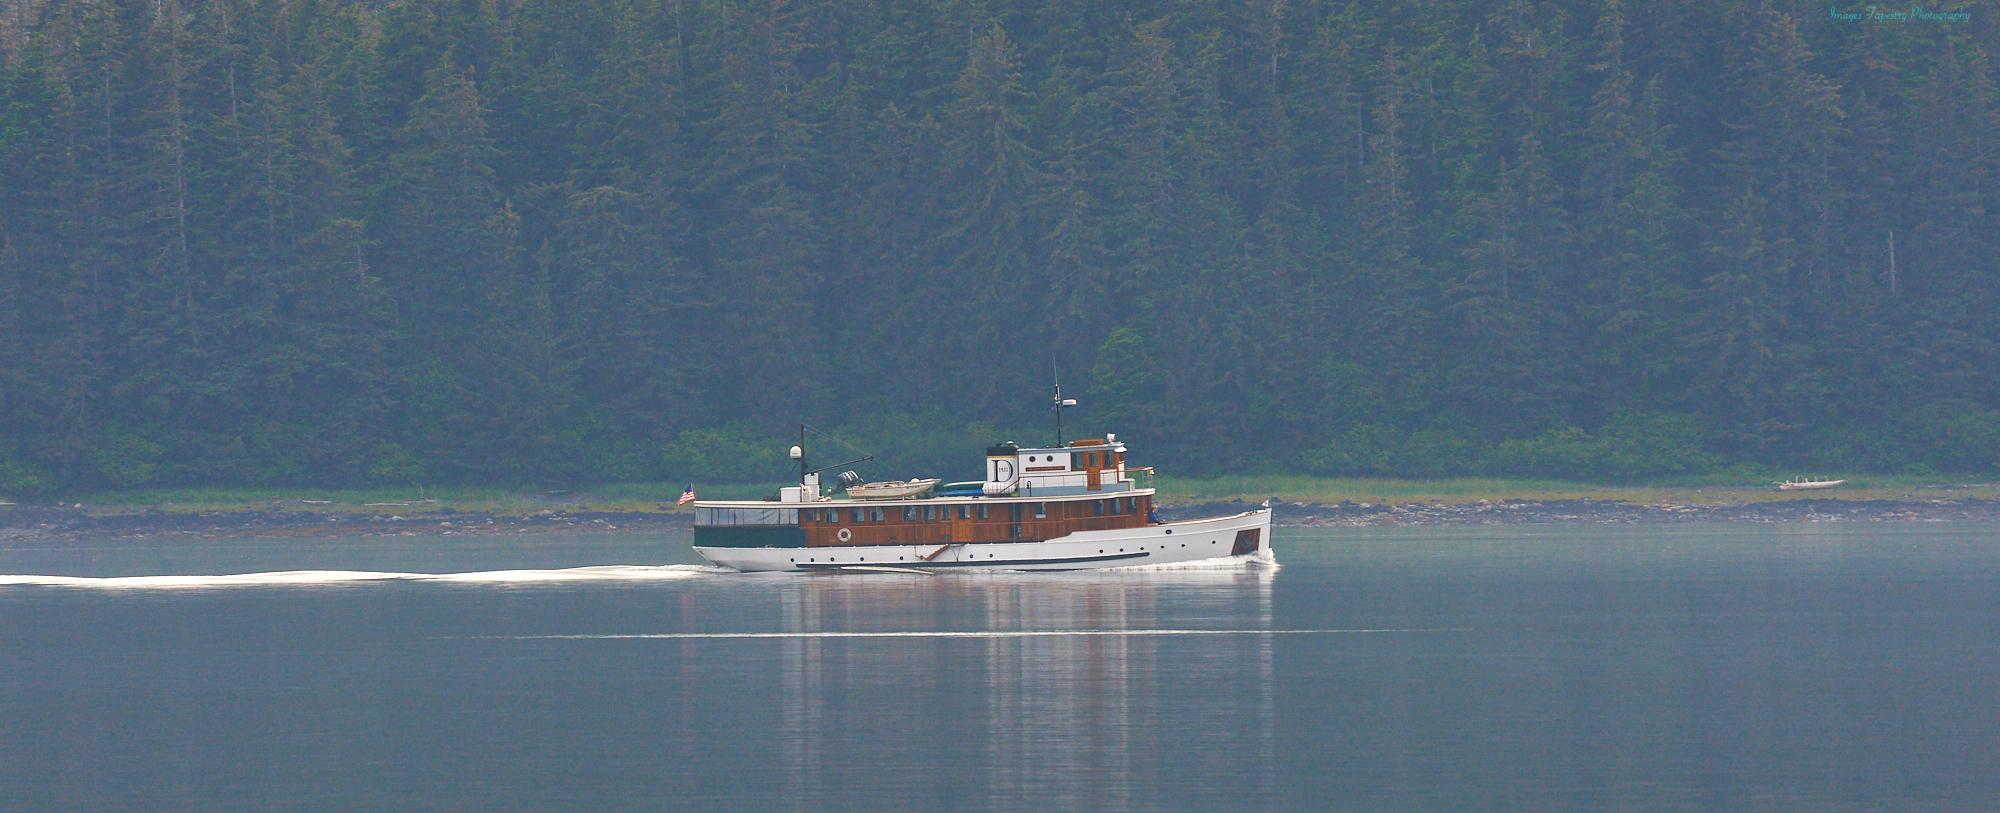 Cruising boat in BC